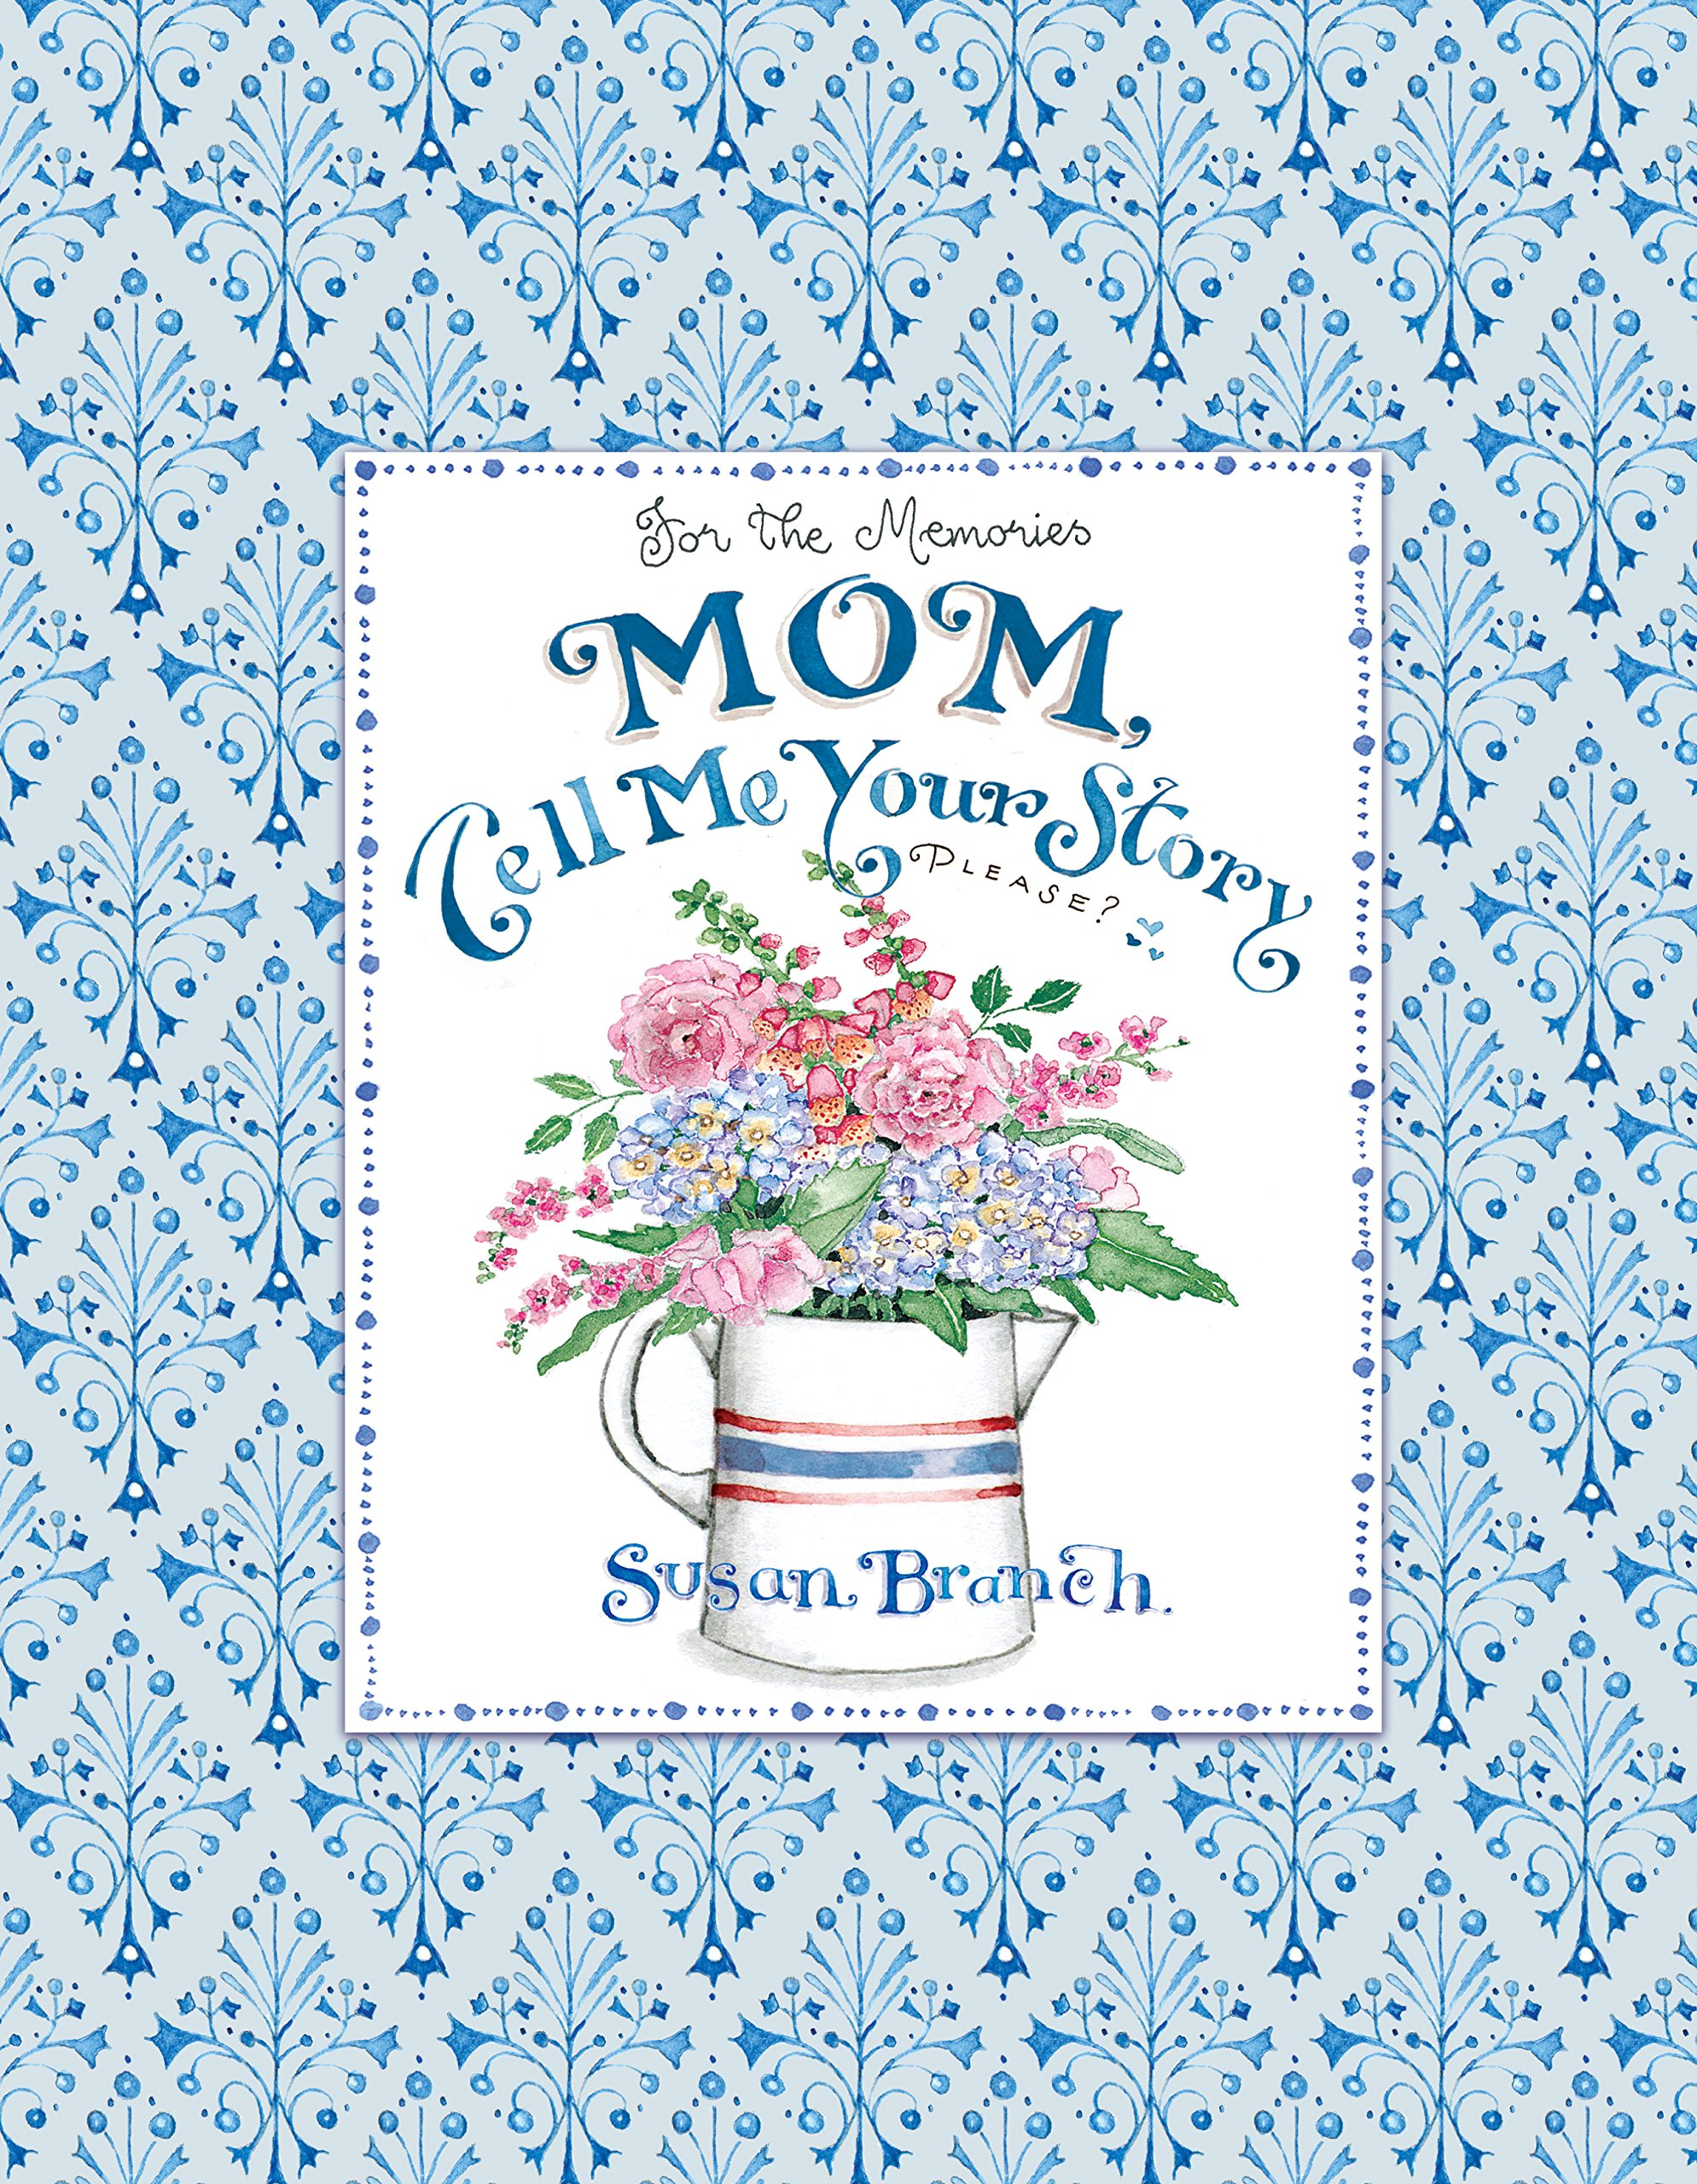 Mom Tell me Your Story - Keepsake Journal Hardcover – December 1, 2014 Publications International Ltd. 1450894844 Sale Books